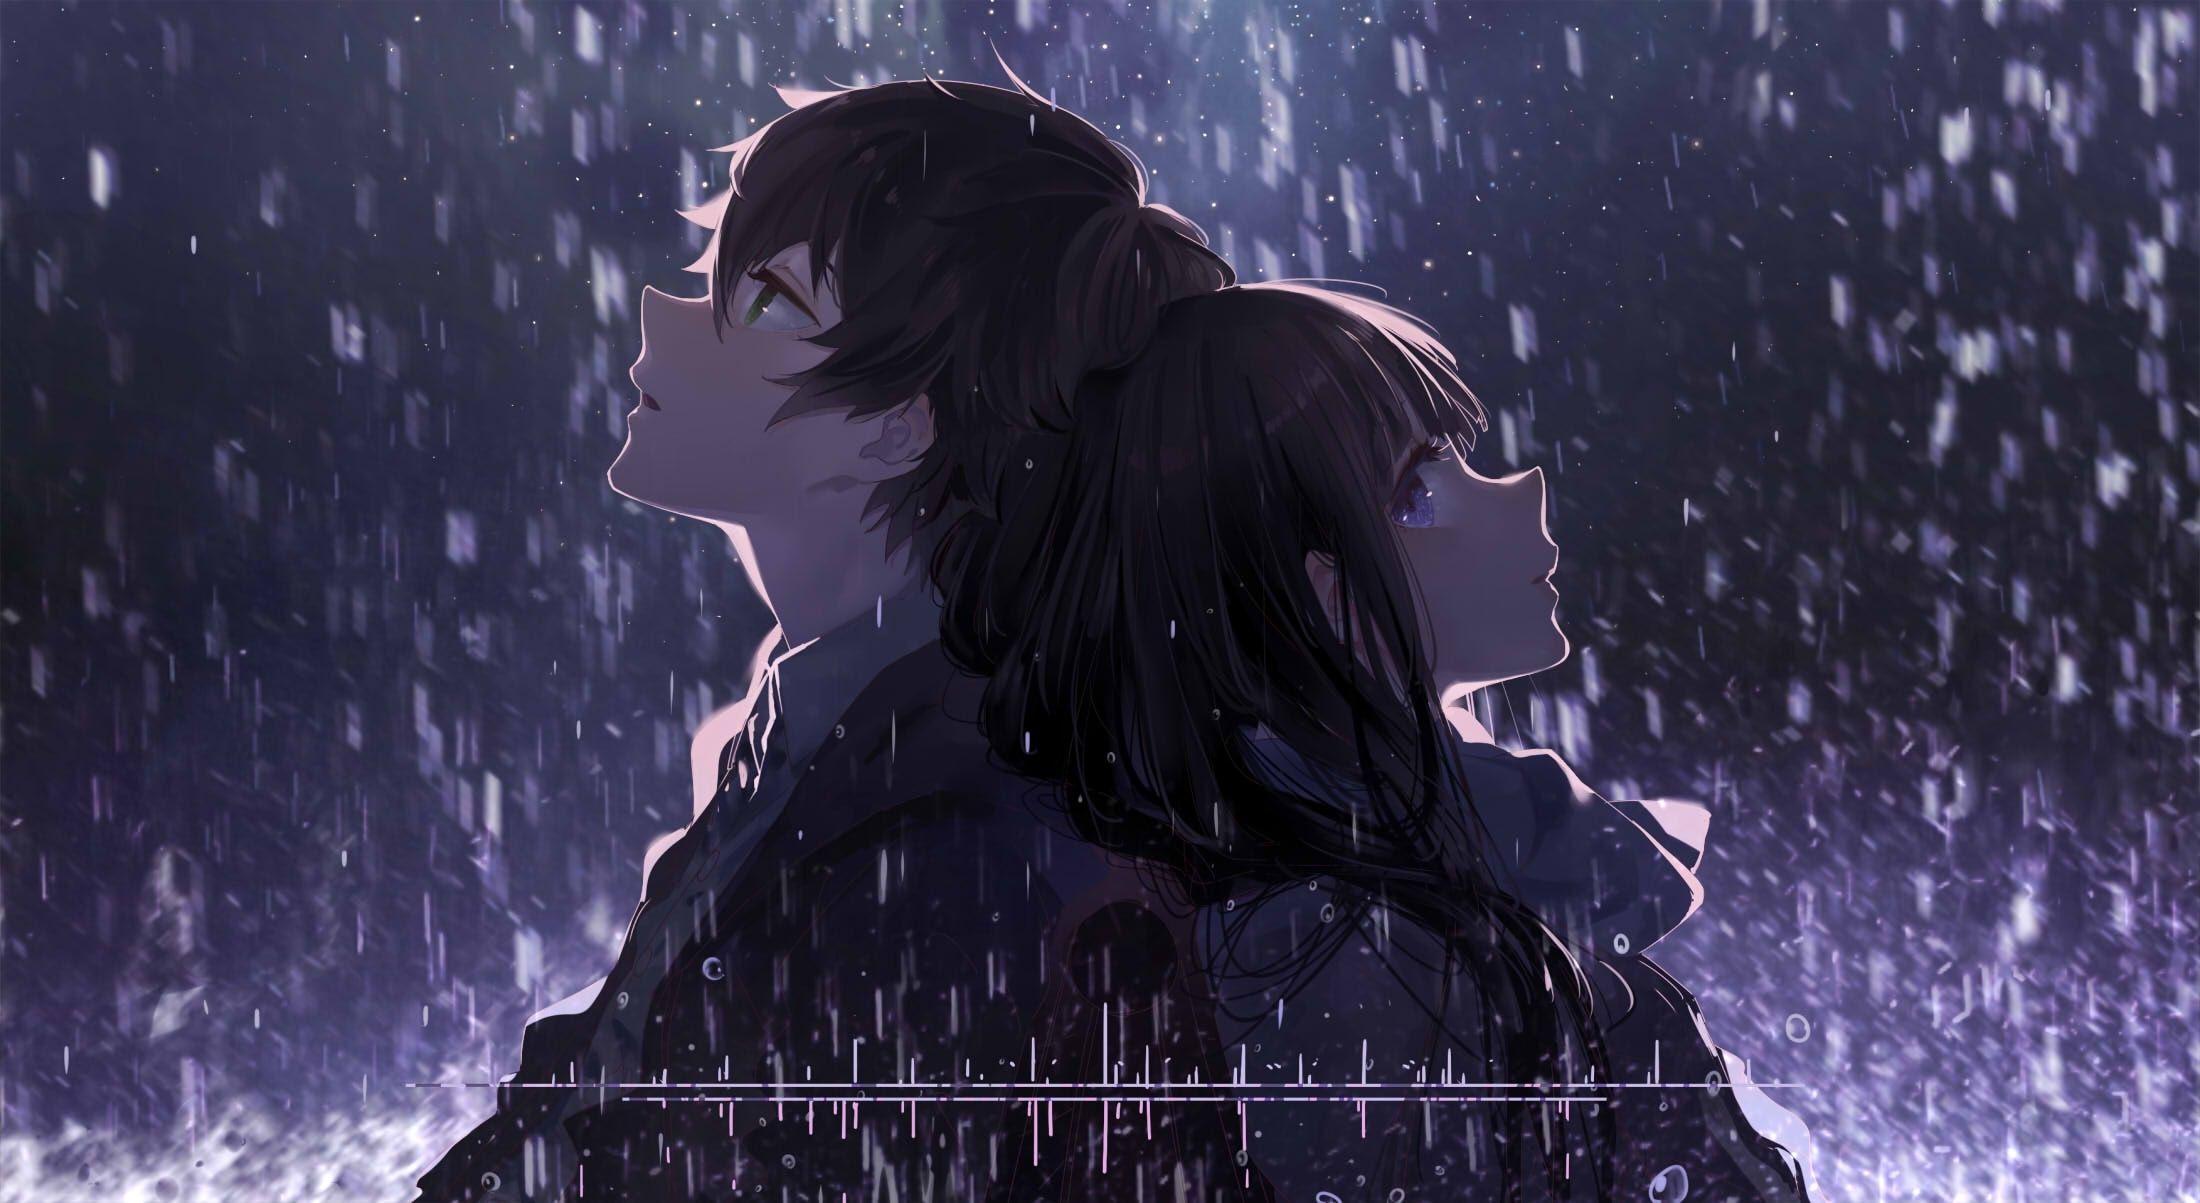 Oreki Houtarou Chitanda Eru Anime Couple Profile View Romance Hyouka Hyouka Gambar Anime Ilustrasi Karakter